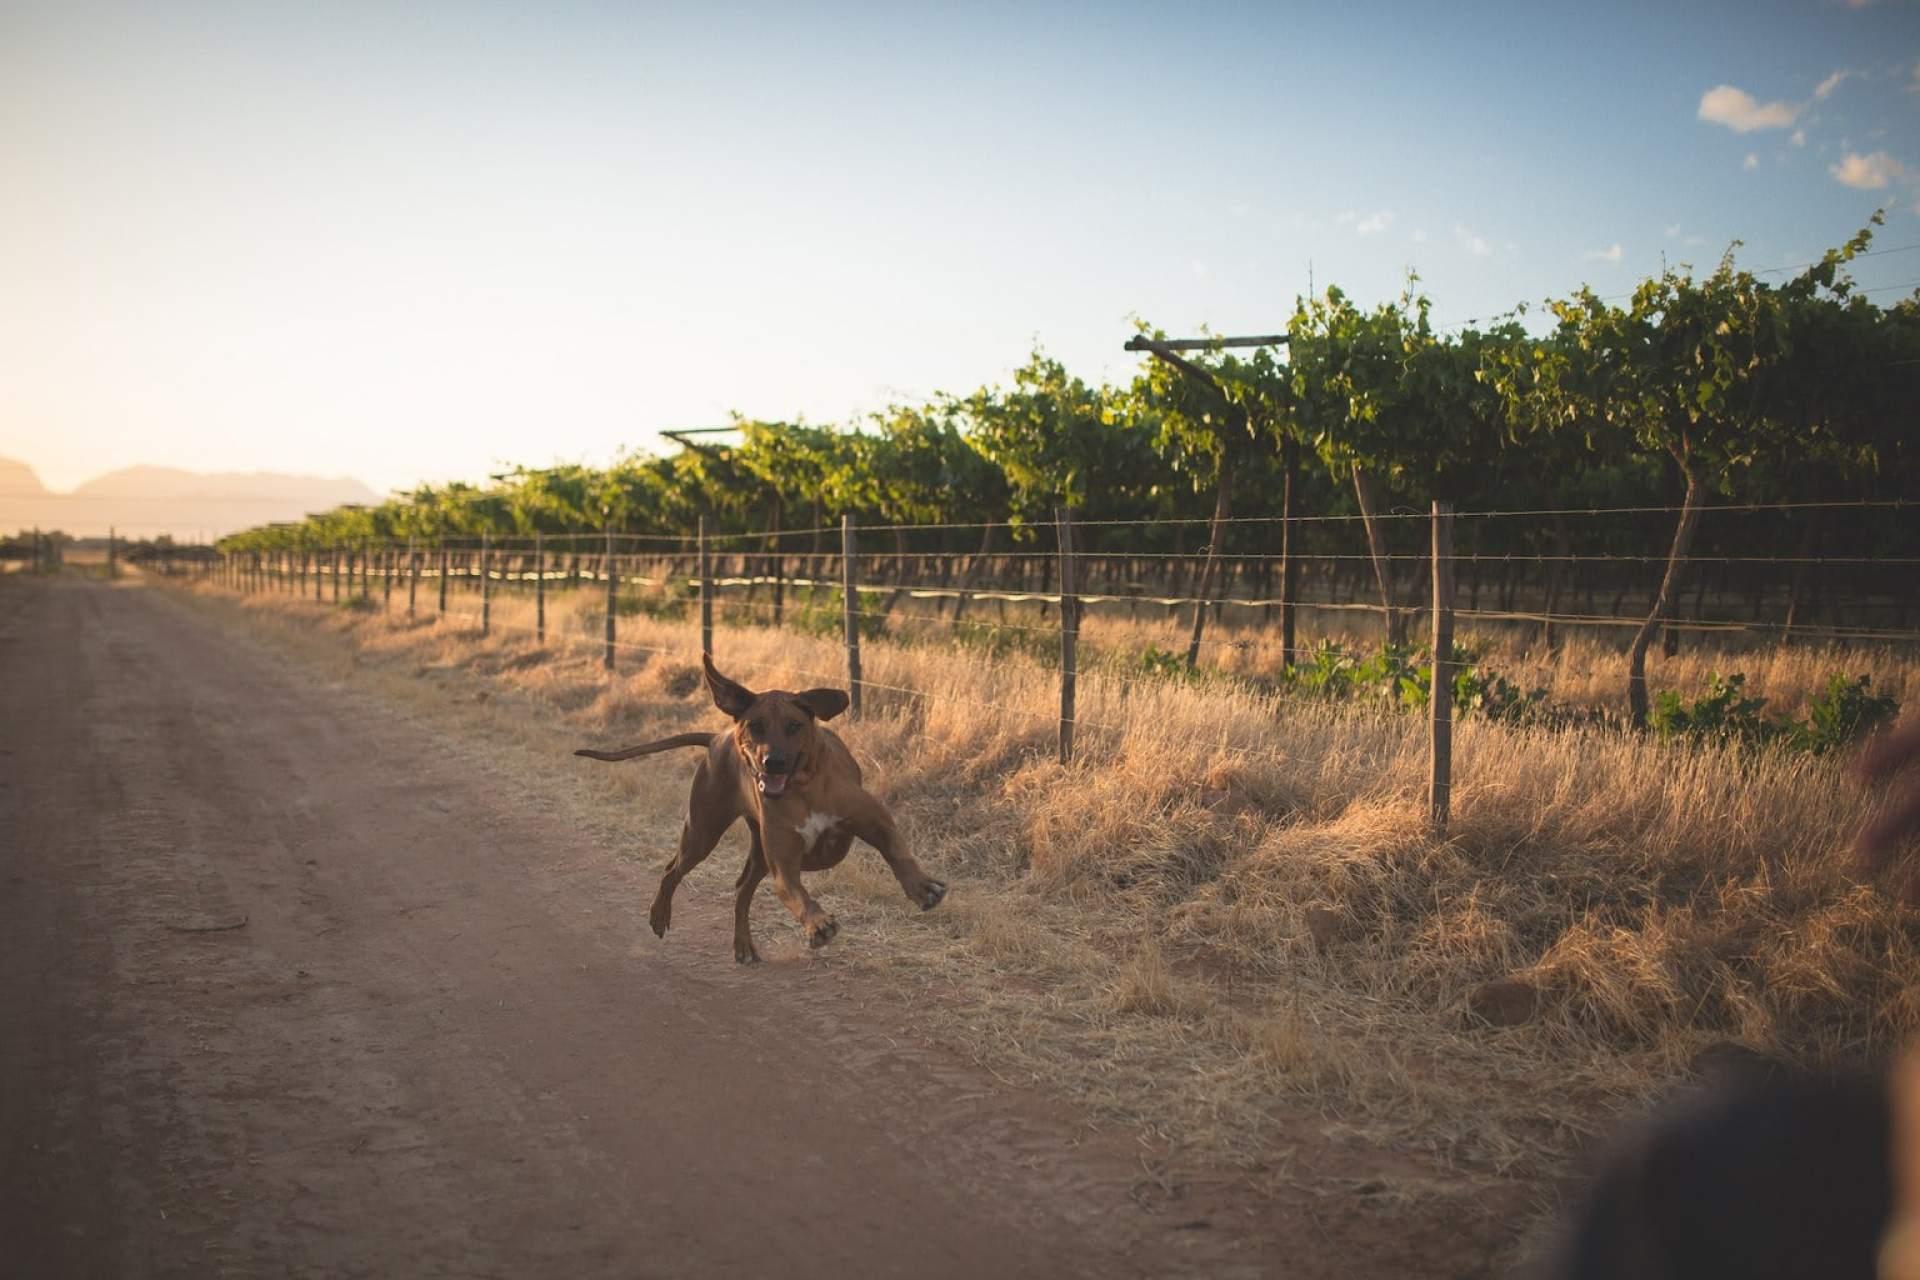 Frolicking ridgeback on a wine farm in Worcester